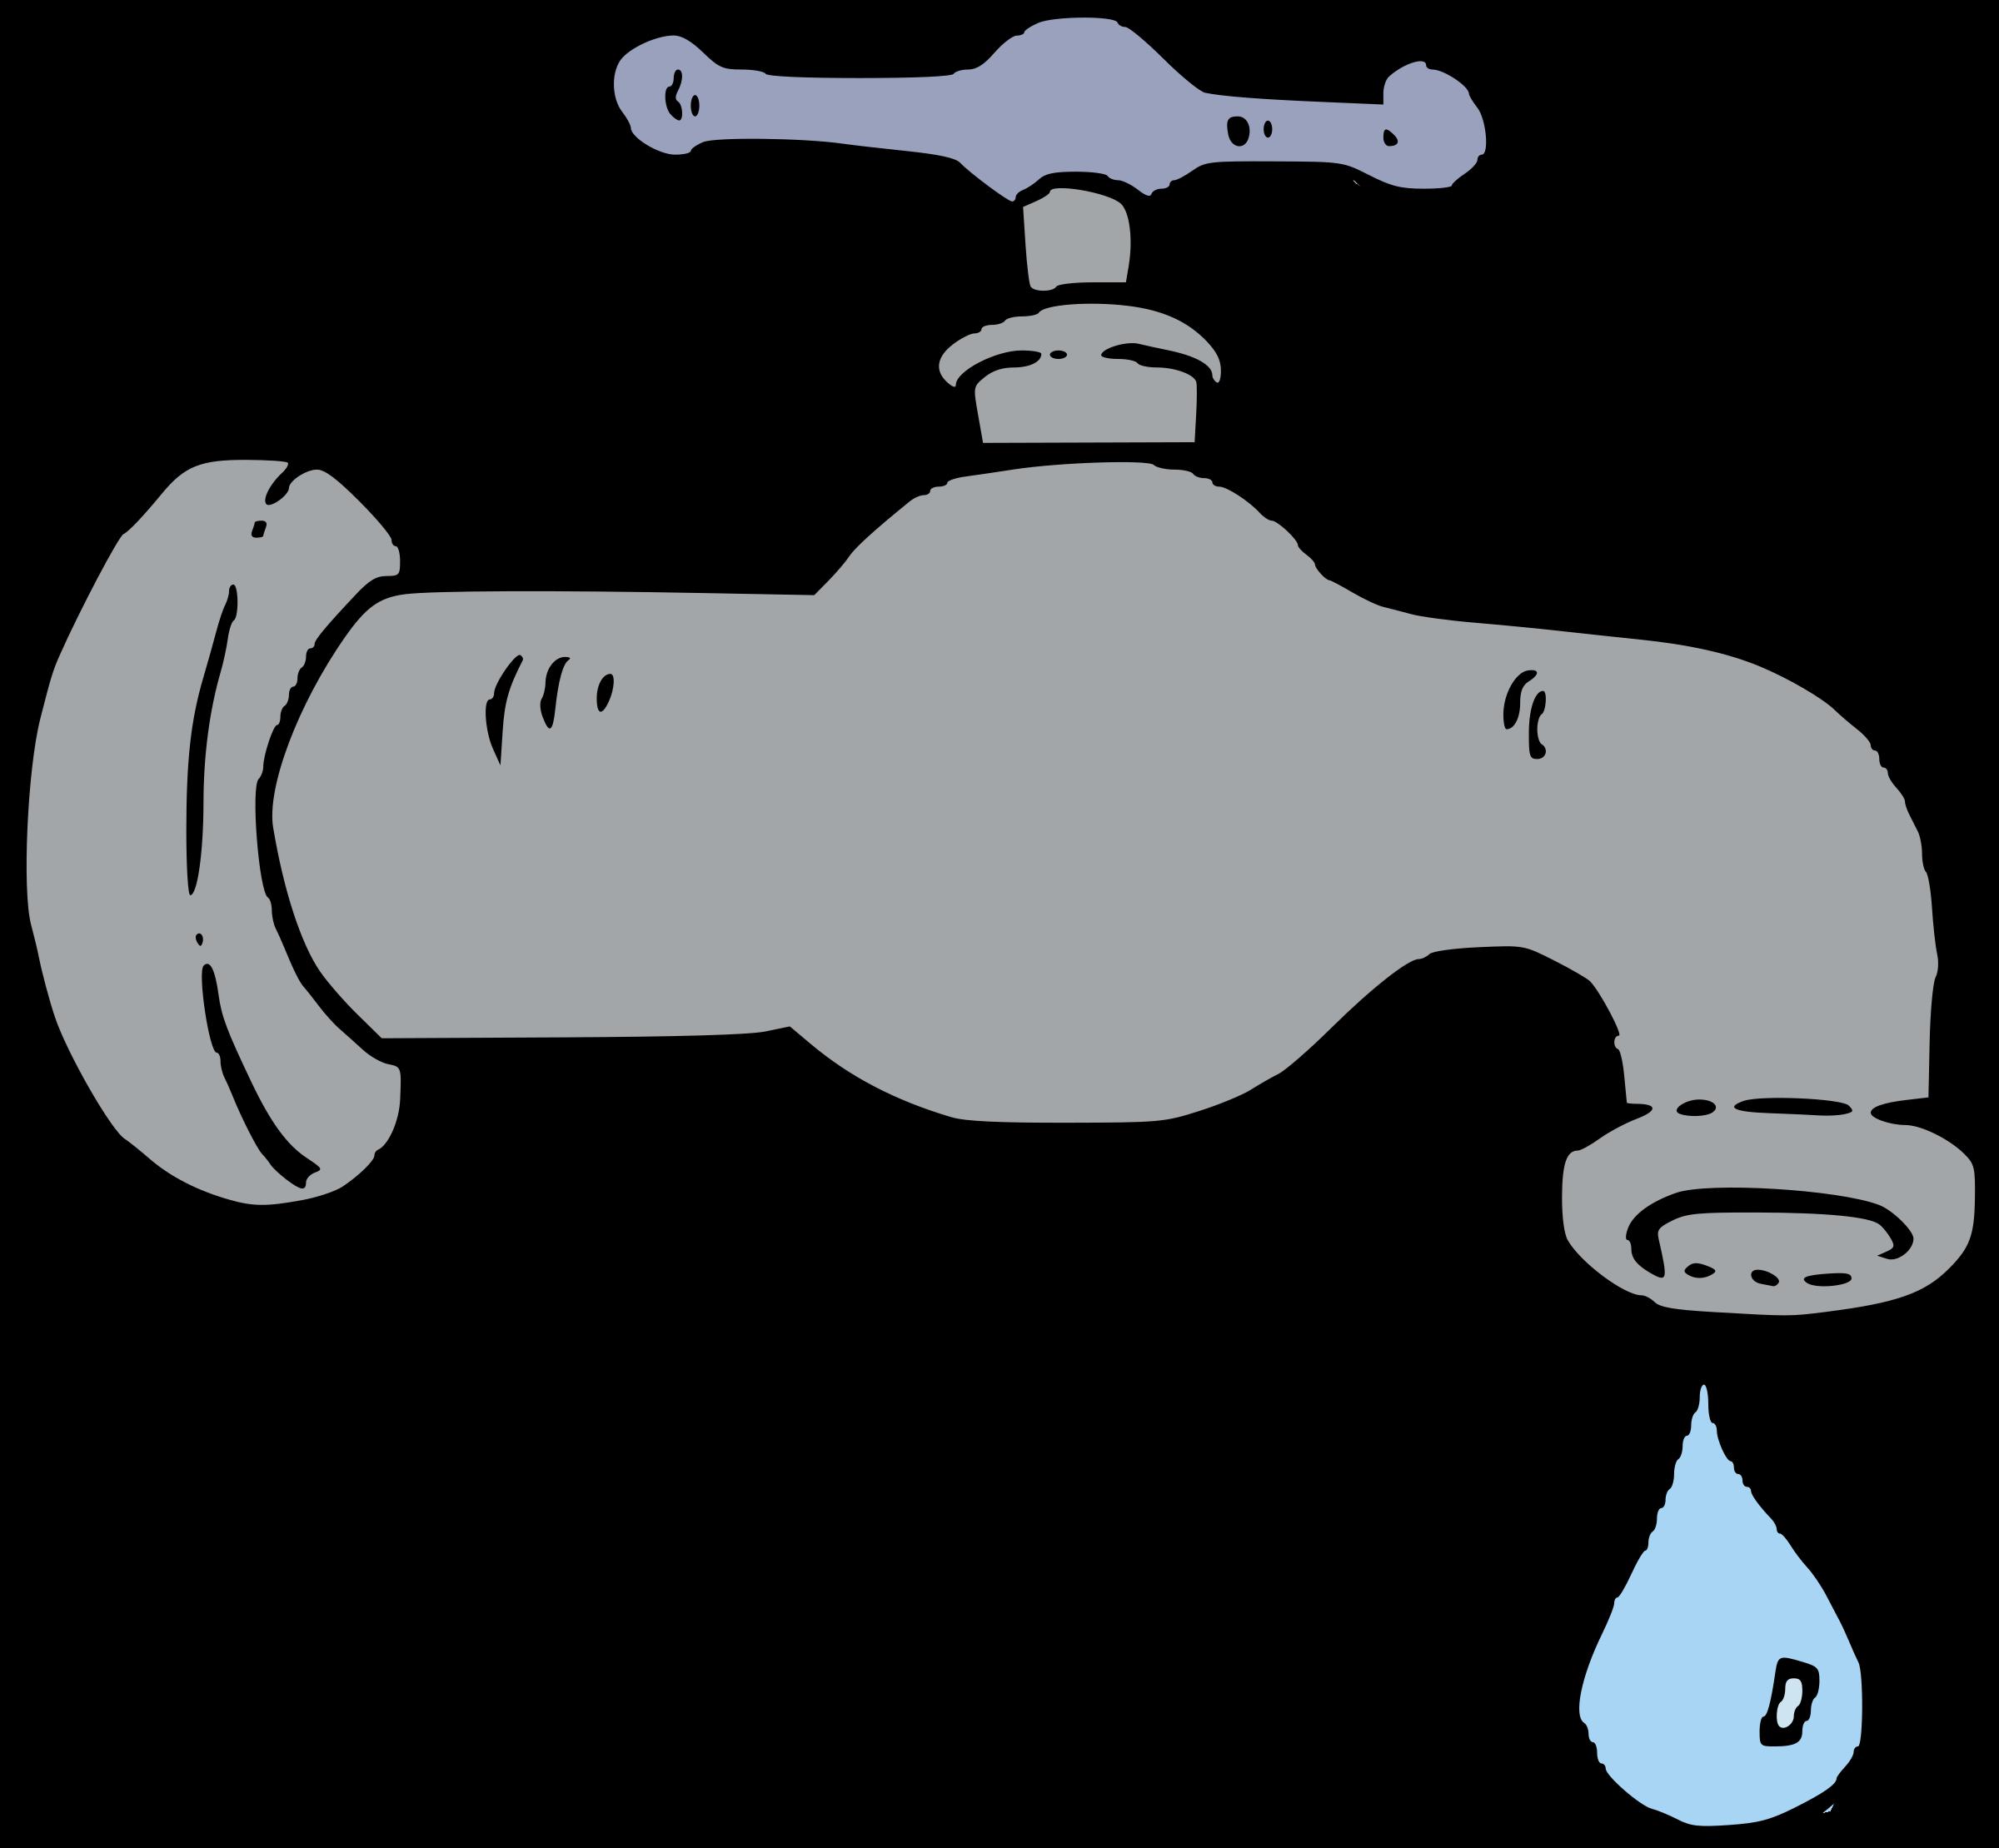 clip art Faucet clipart. Water big image png